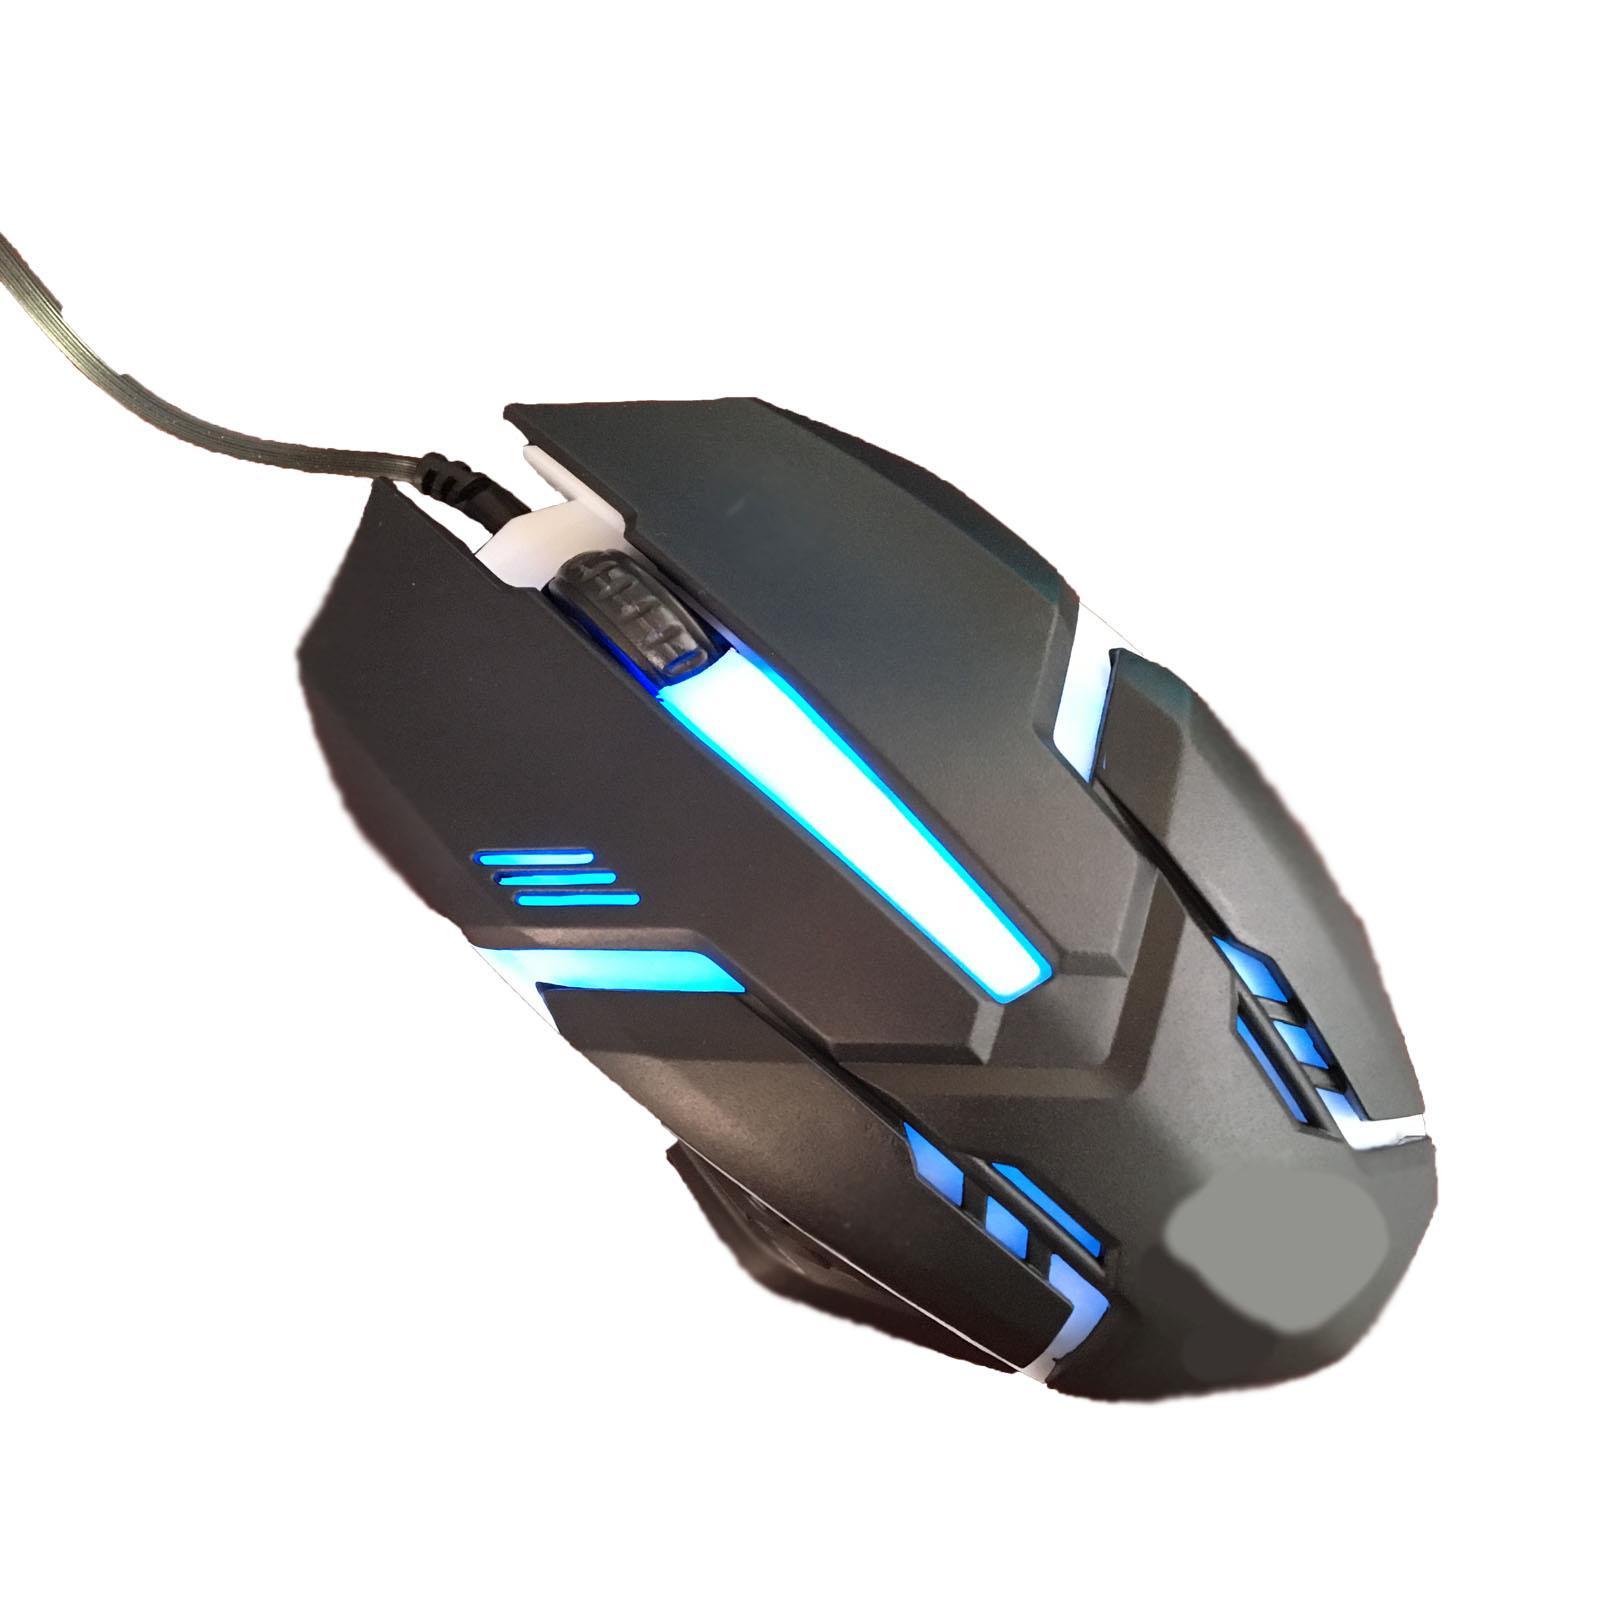 Gaming-Keyboard-Mouse-Backlit-Rainbow-LED-USB-Set-for-PC-Laptop-PS4-Xbox-One thumbnail 20